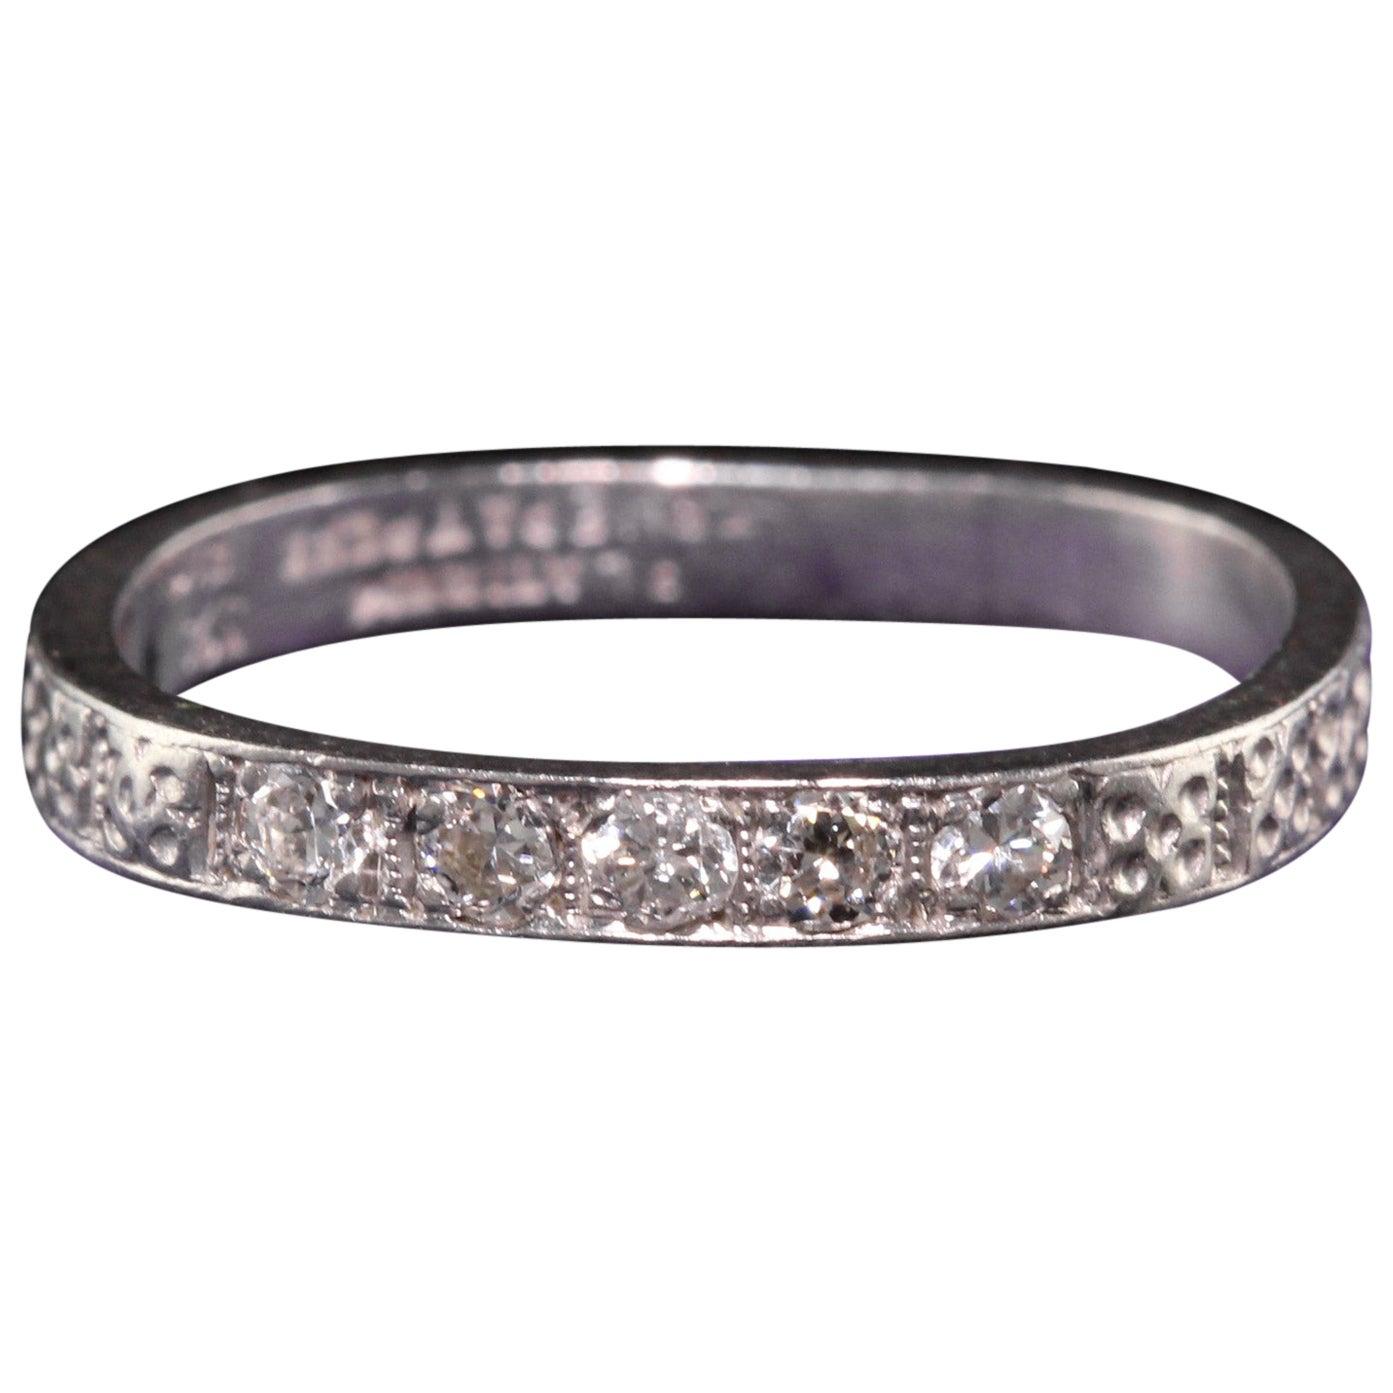 Antique Art Deco Platinum Five Diamond Engraved Wedding Band